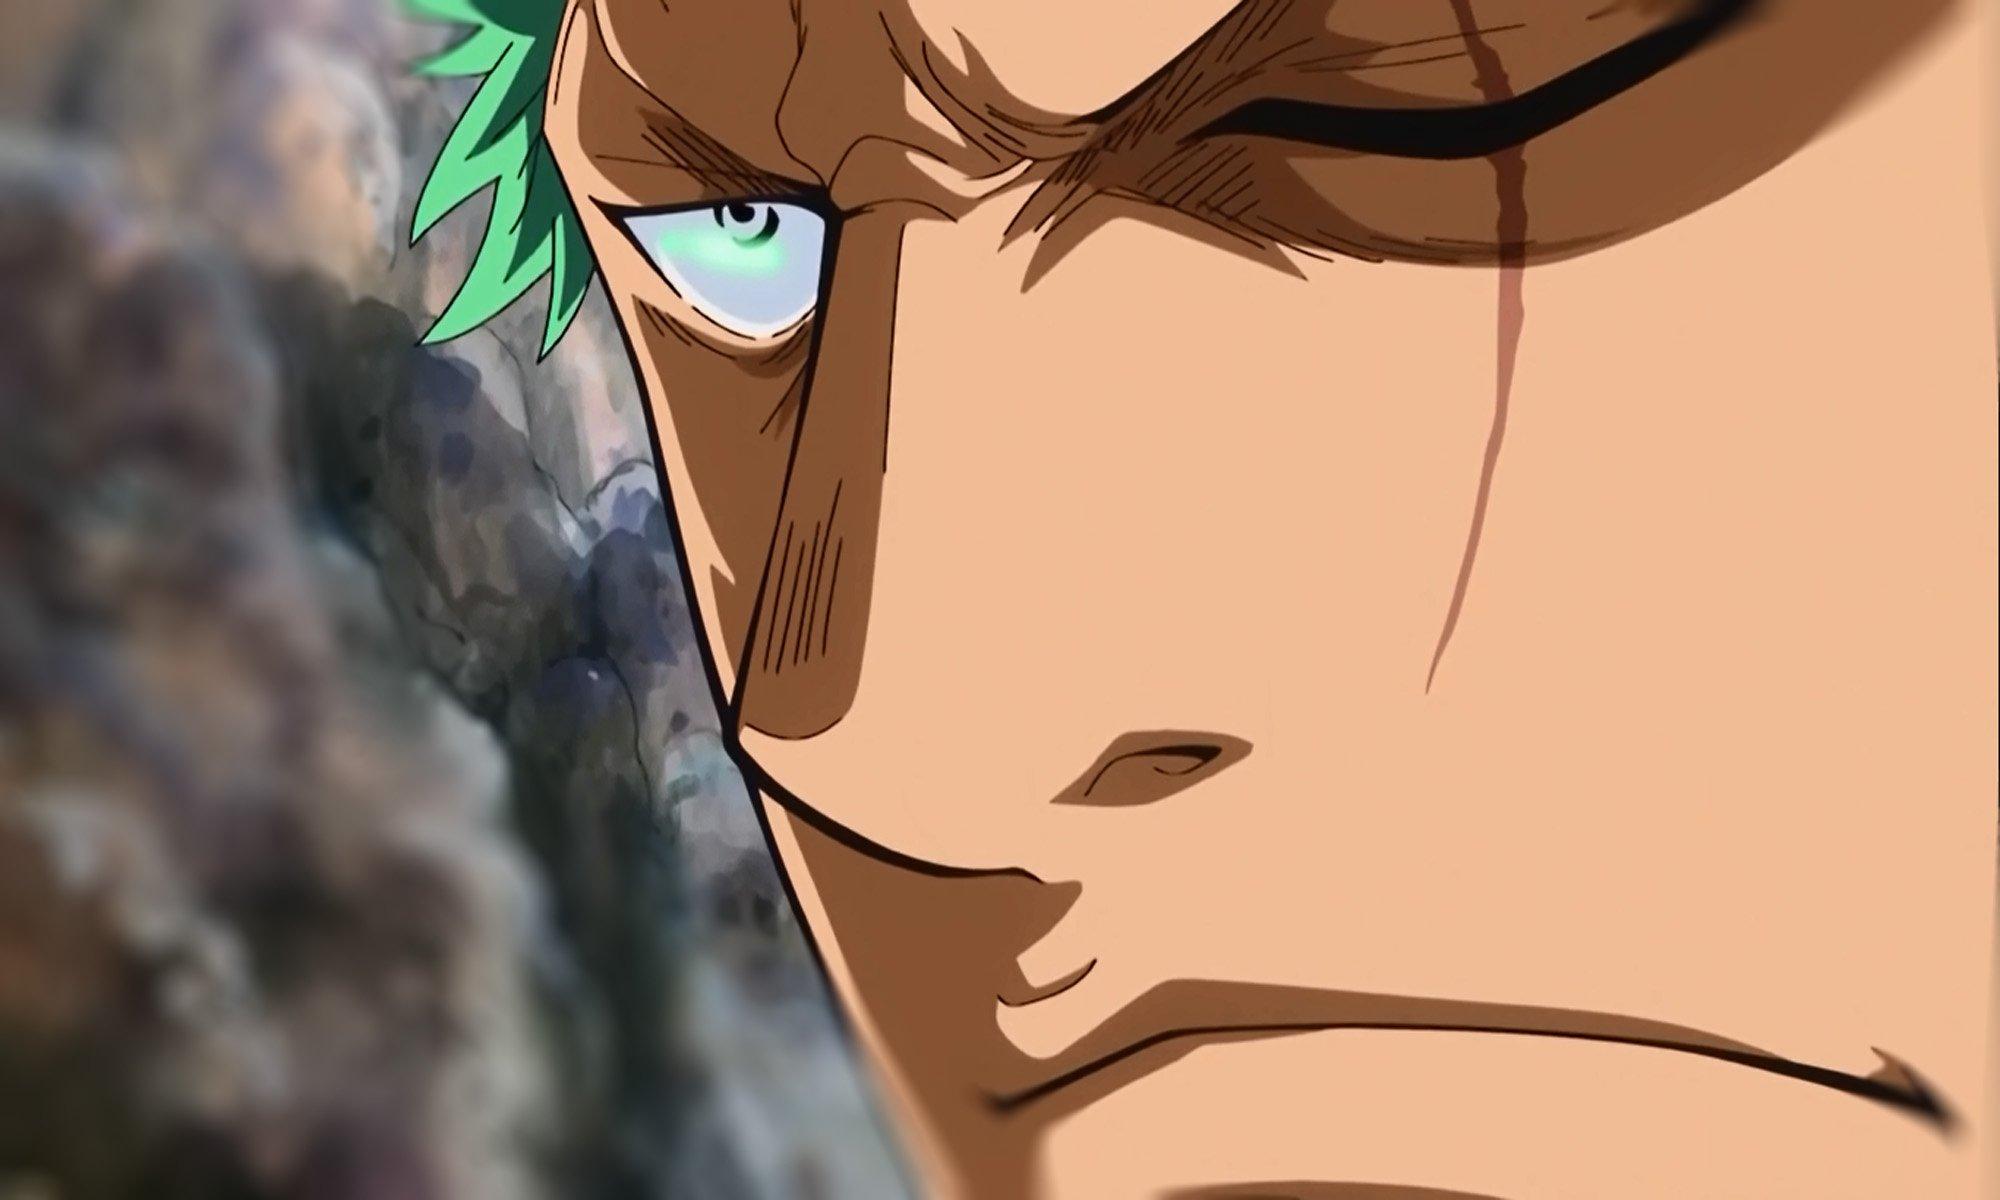 Zoro The Best Swordsman Edgy One Piece Best Wallpaper Anime Hd Wallpaper 2000x1200 995320 Wallpaperup